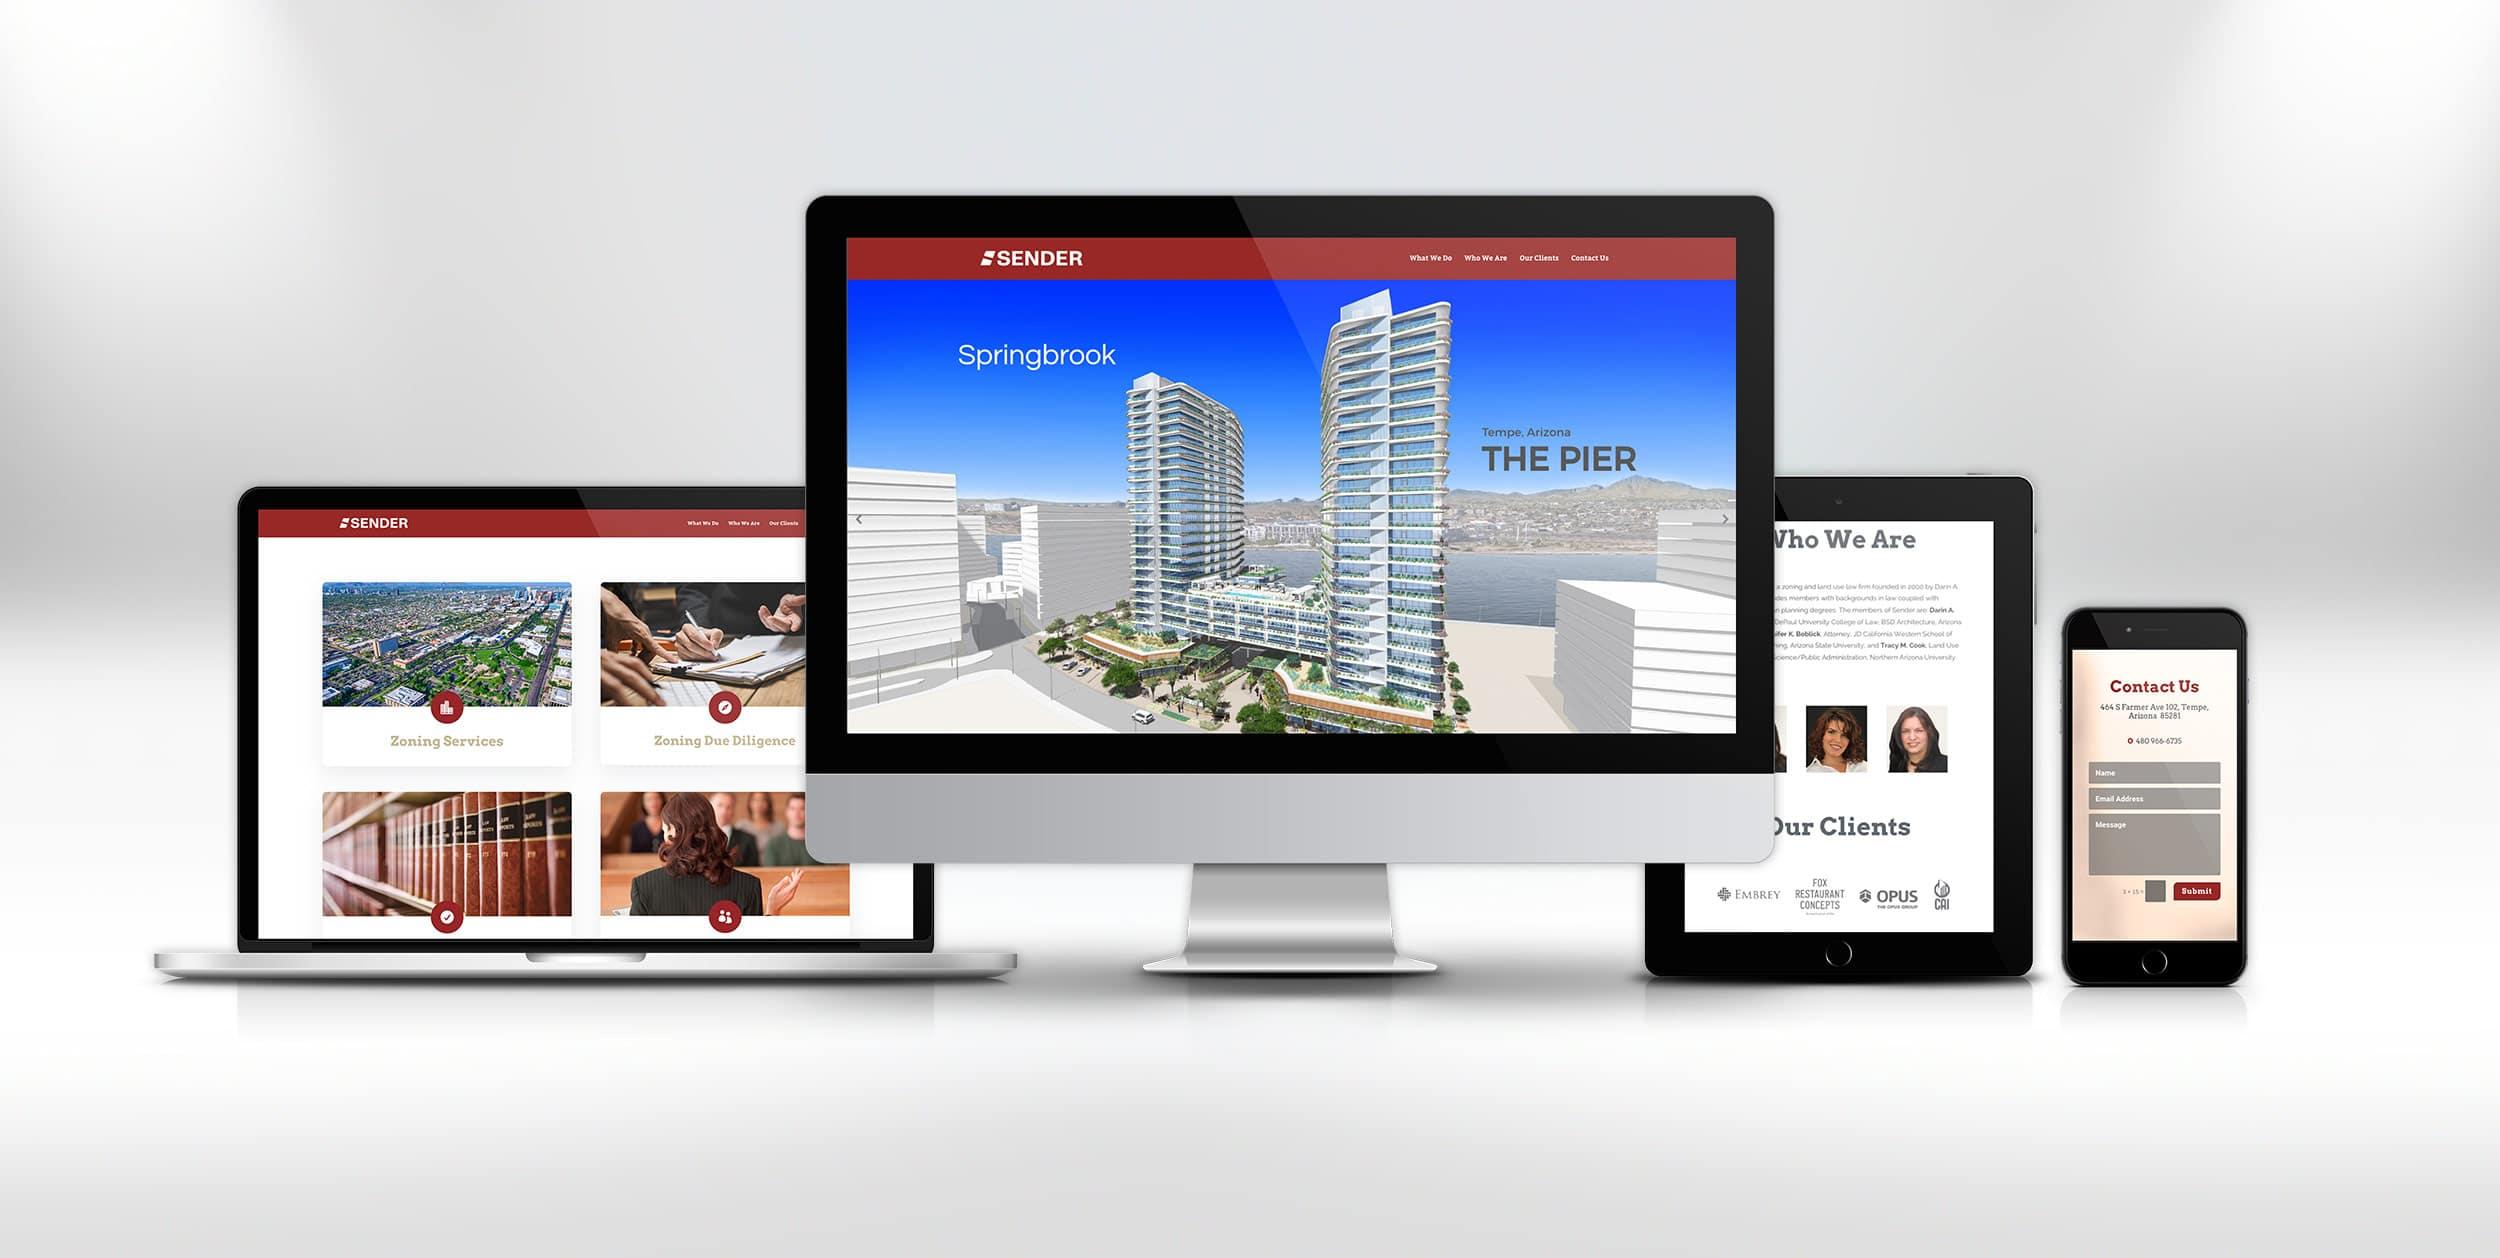 sender rebrand website